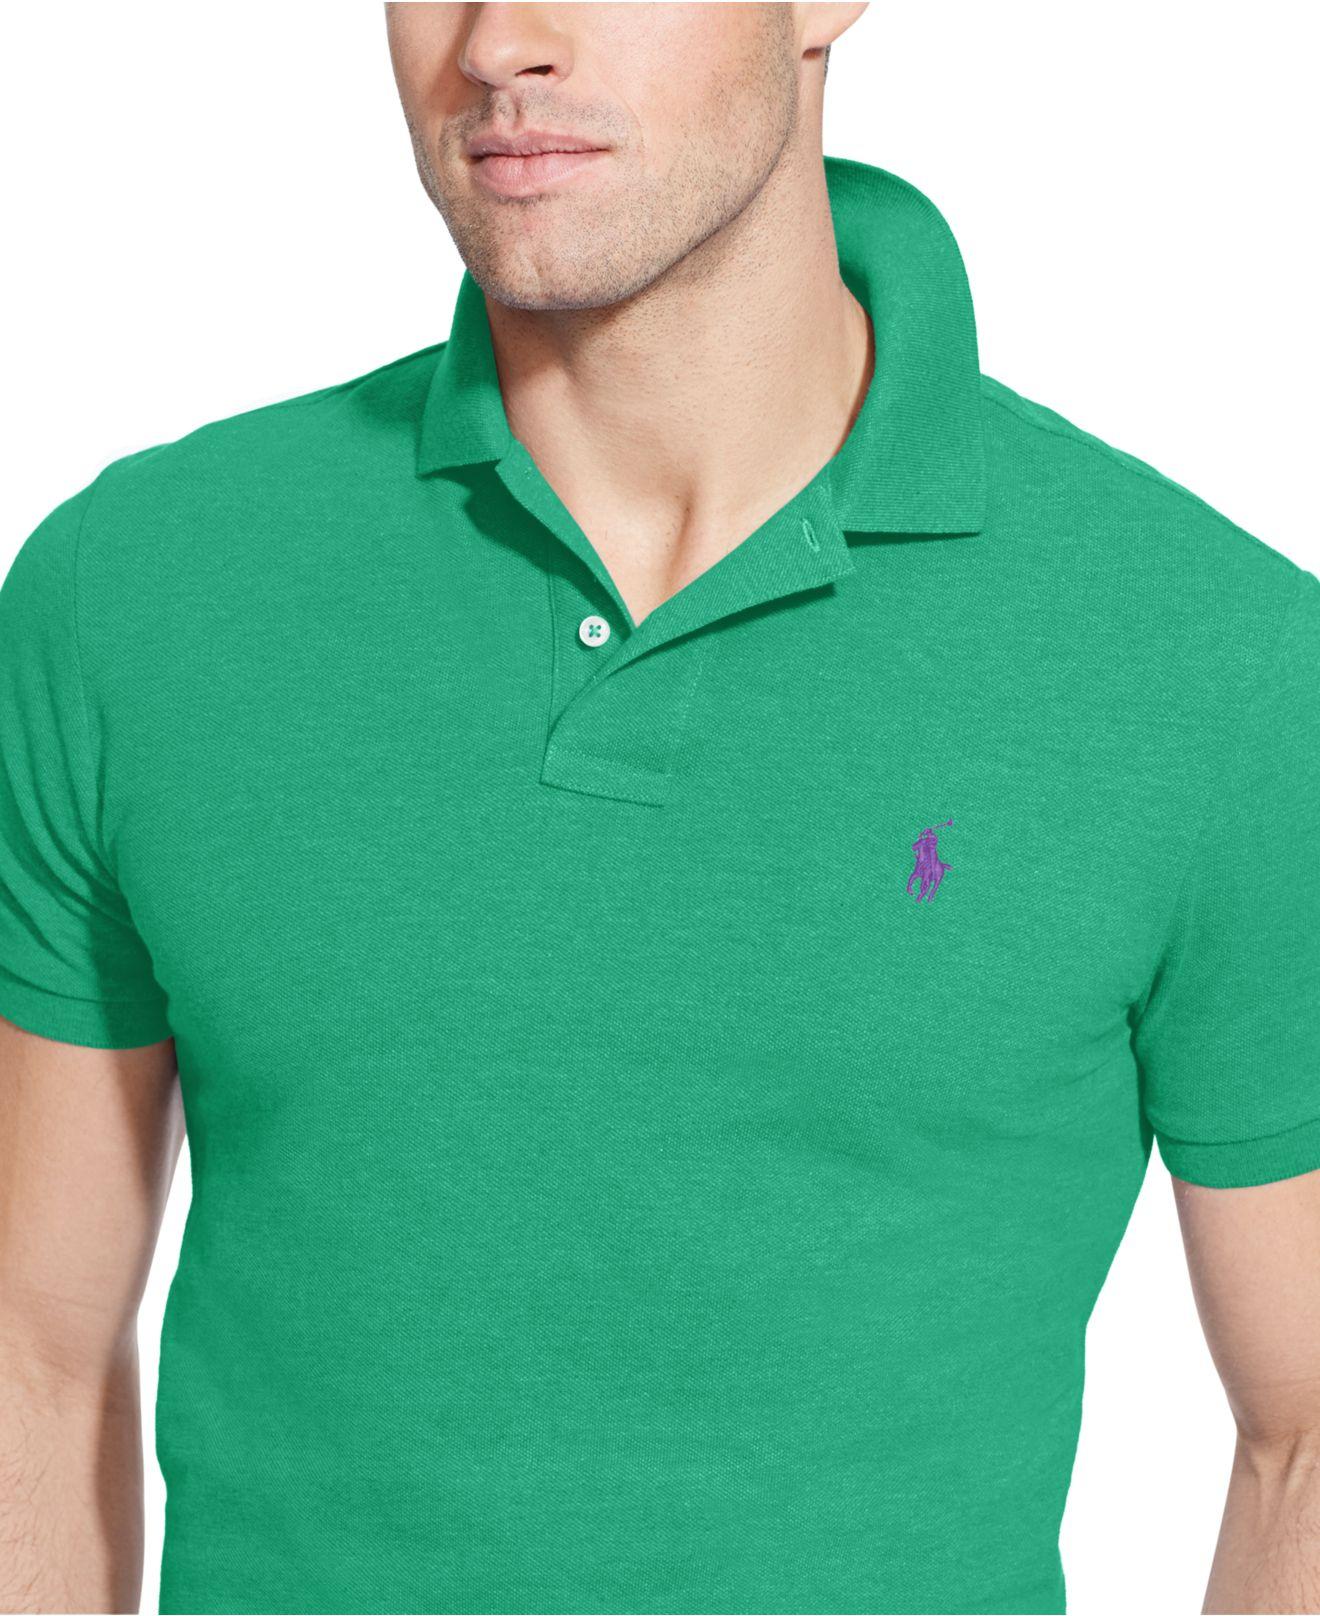 Polo Ralph Lauren Mens Custom Fit Interlock Polo Shirt Bcd Tofu House